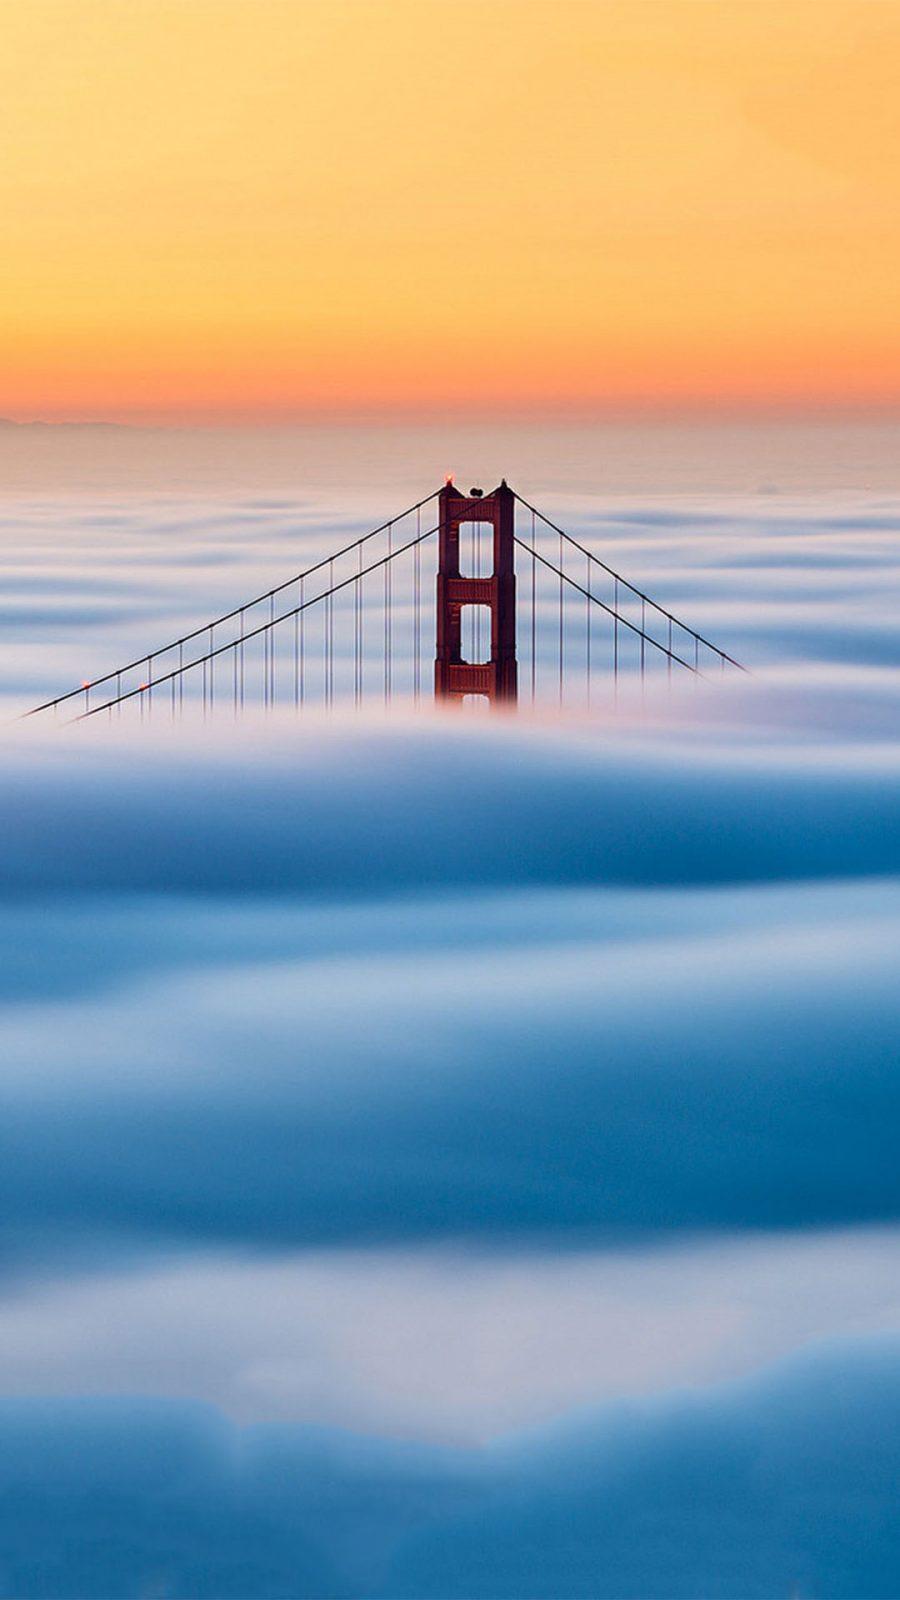 Love Quotes For Desktop Wallpapers Golden Gate Bridge Iphone Wallpaper Iphone Wallpapers